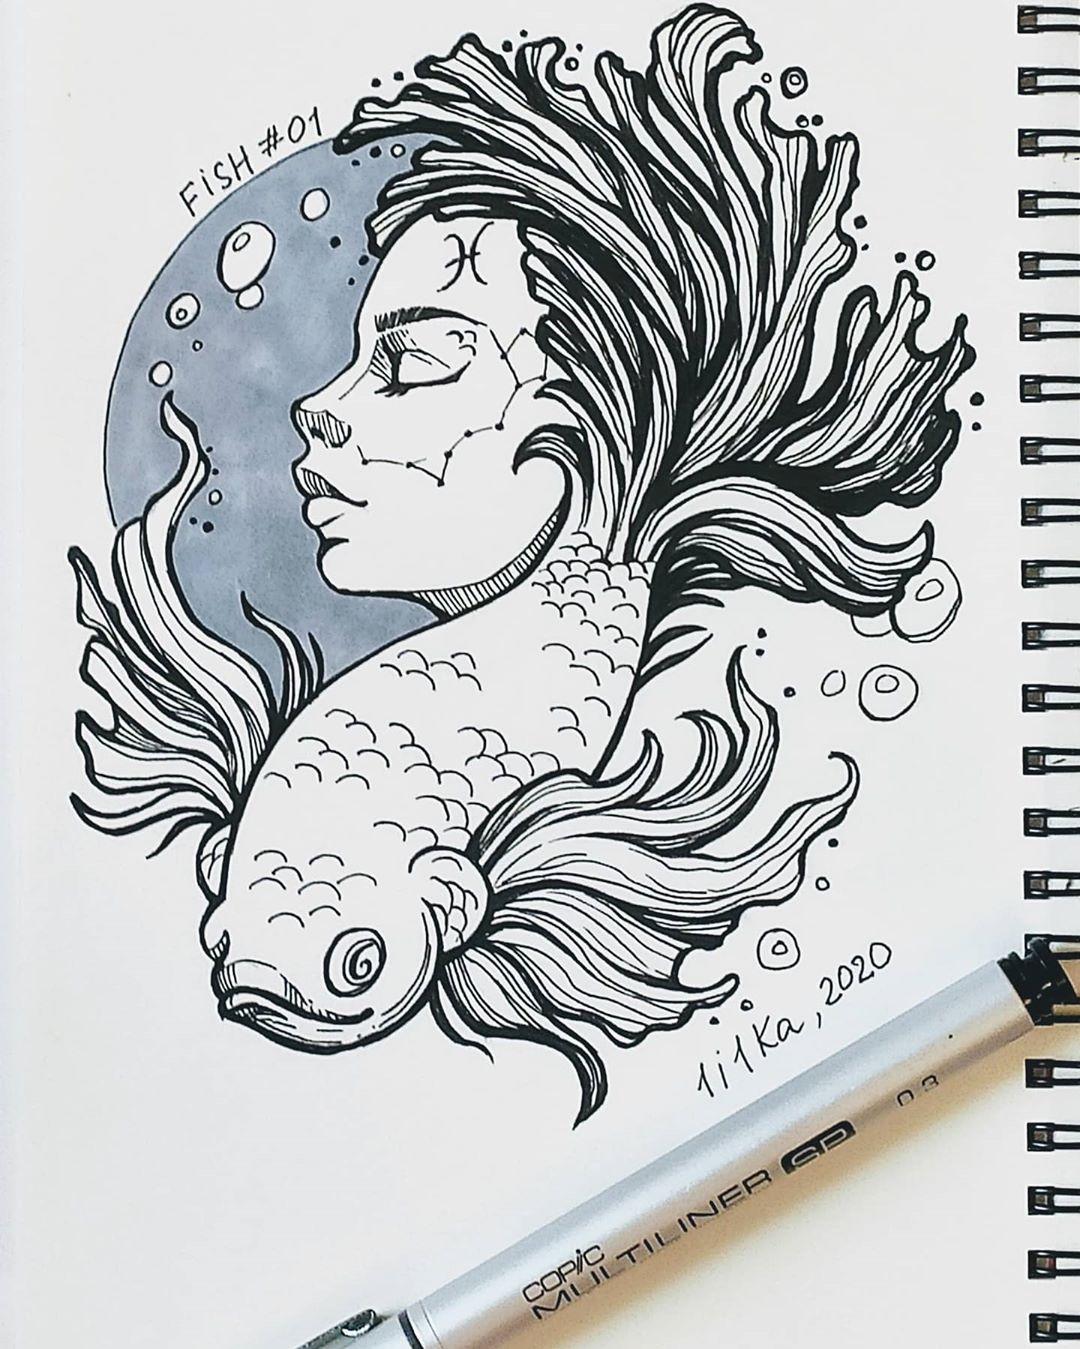 Inktober Fish - 1i1ka11